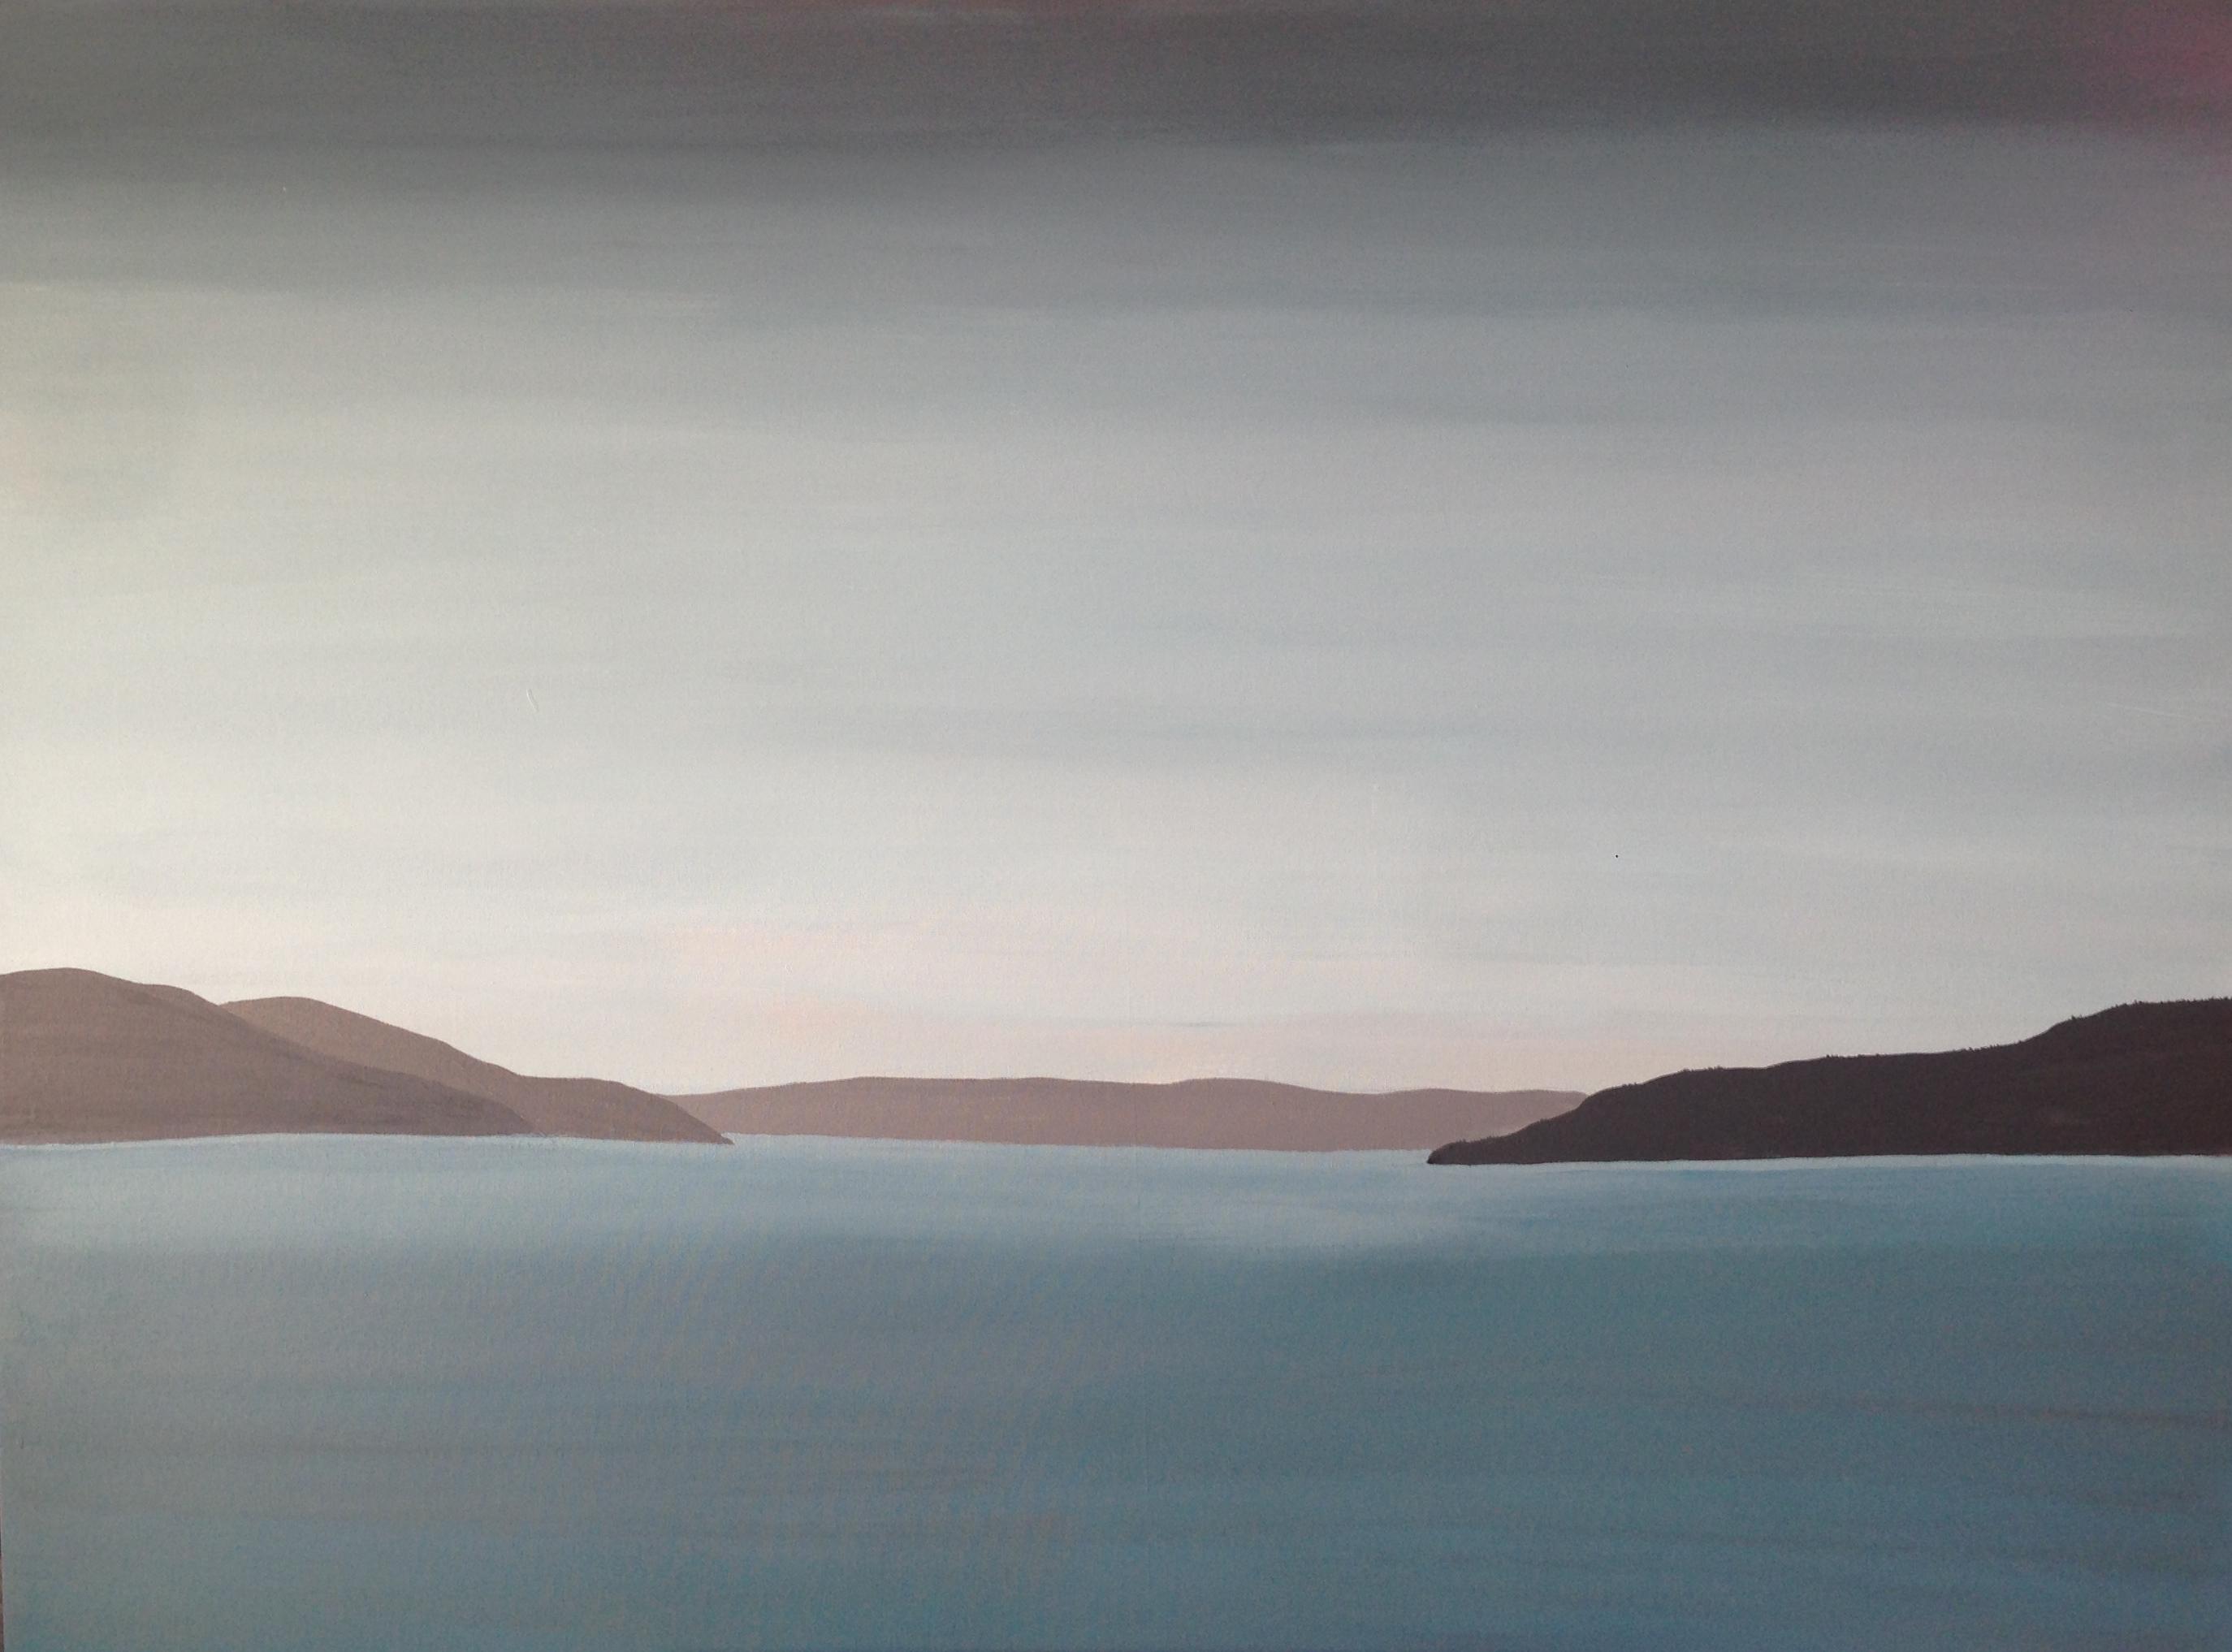 Winter Sunrise - Okanagan Lake